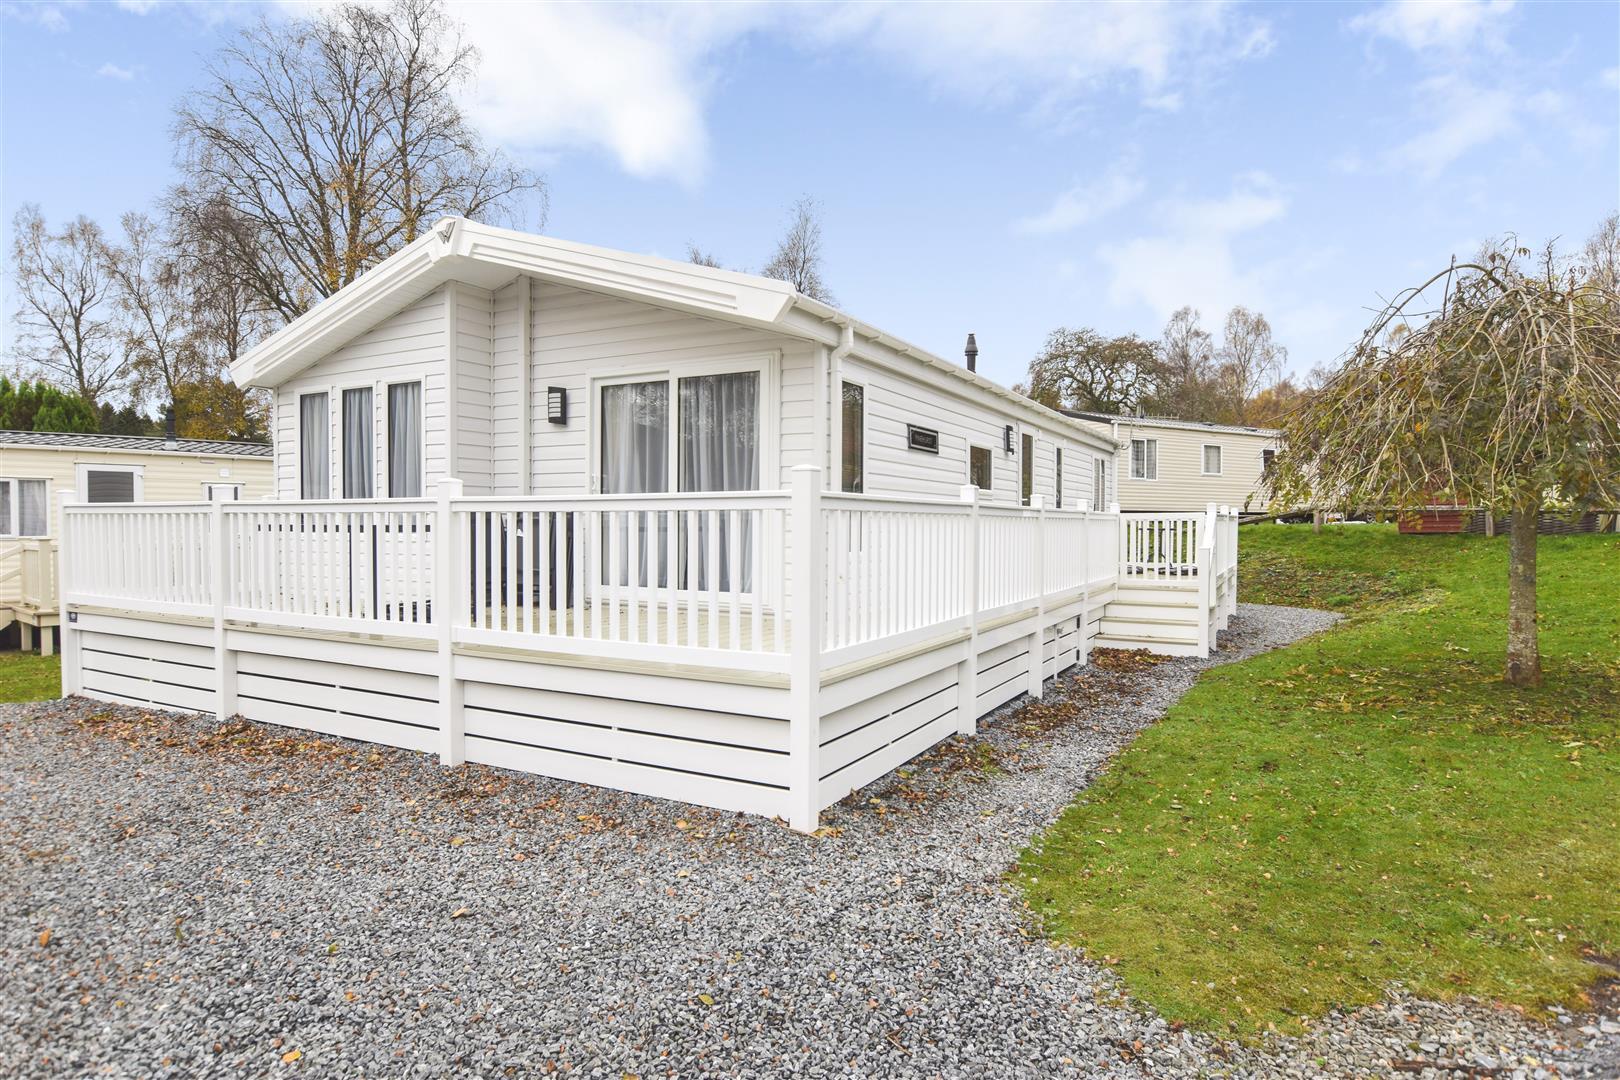 2018 Willerby, Tummel Valley, Parkdean Holiday Park, Tummel Bridge, Tummel Bridge, Perthshire, PH16 5SA, UK